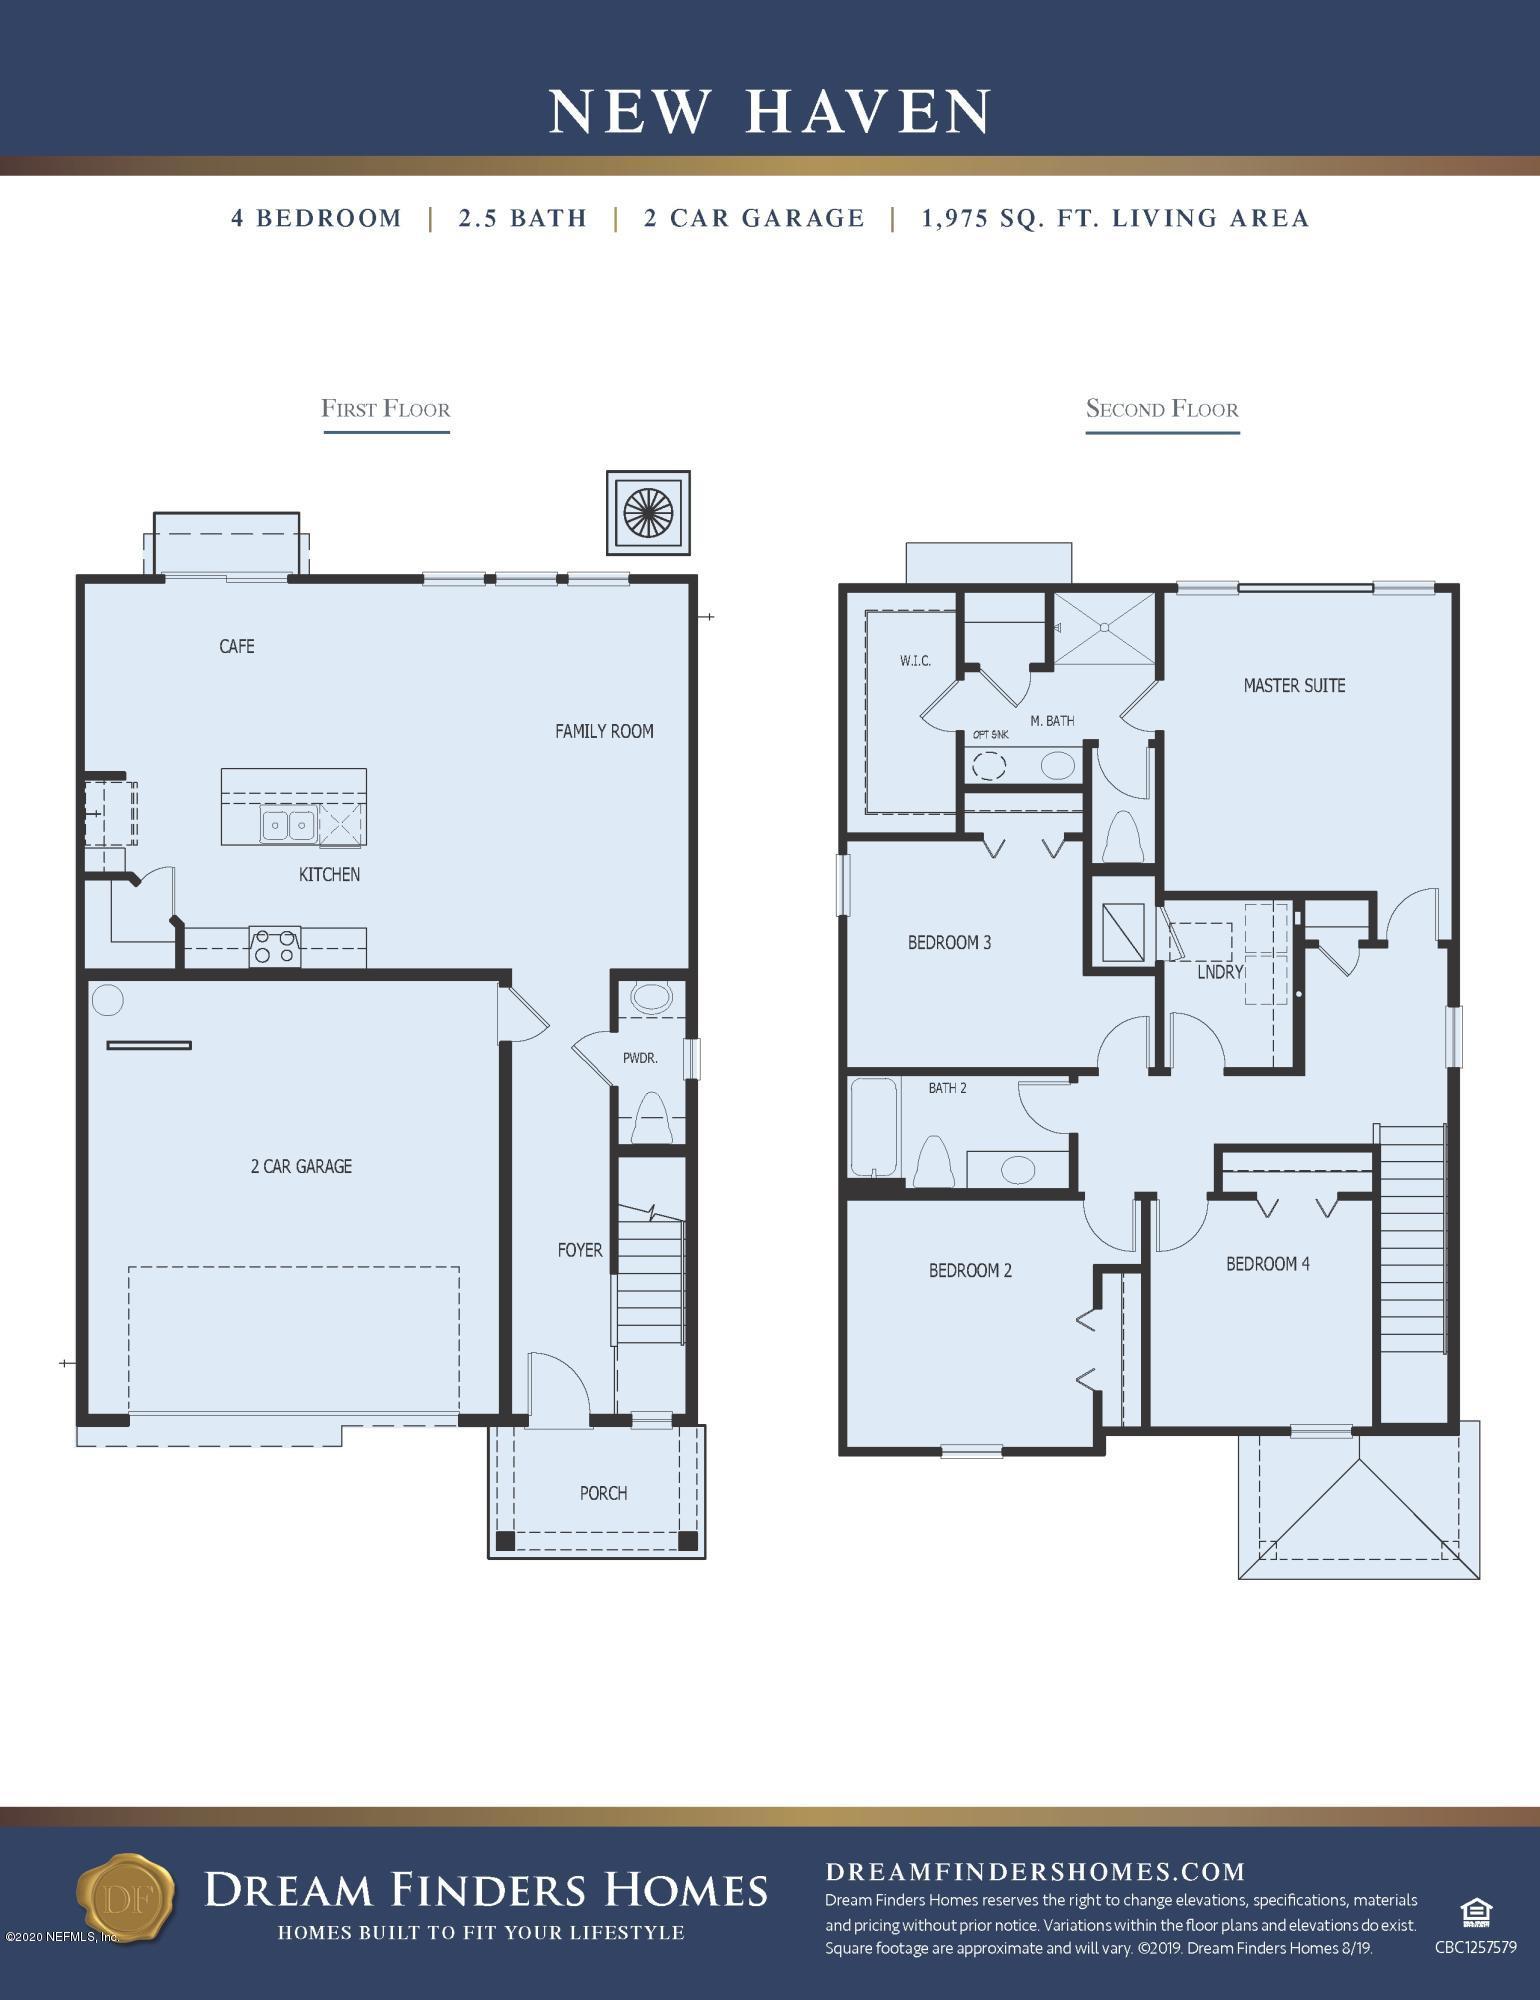 1982 CONSTITUTIONAL REPUBLIC, JACKSONVILLE, FLORIDA 32221, 4 Bedrooms Bedrooms, ,2 BathroomsBathrooms,Residential,For sale,CONSTITUTIONAL REPUBLIC,1083355